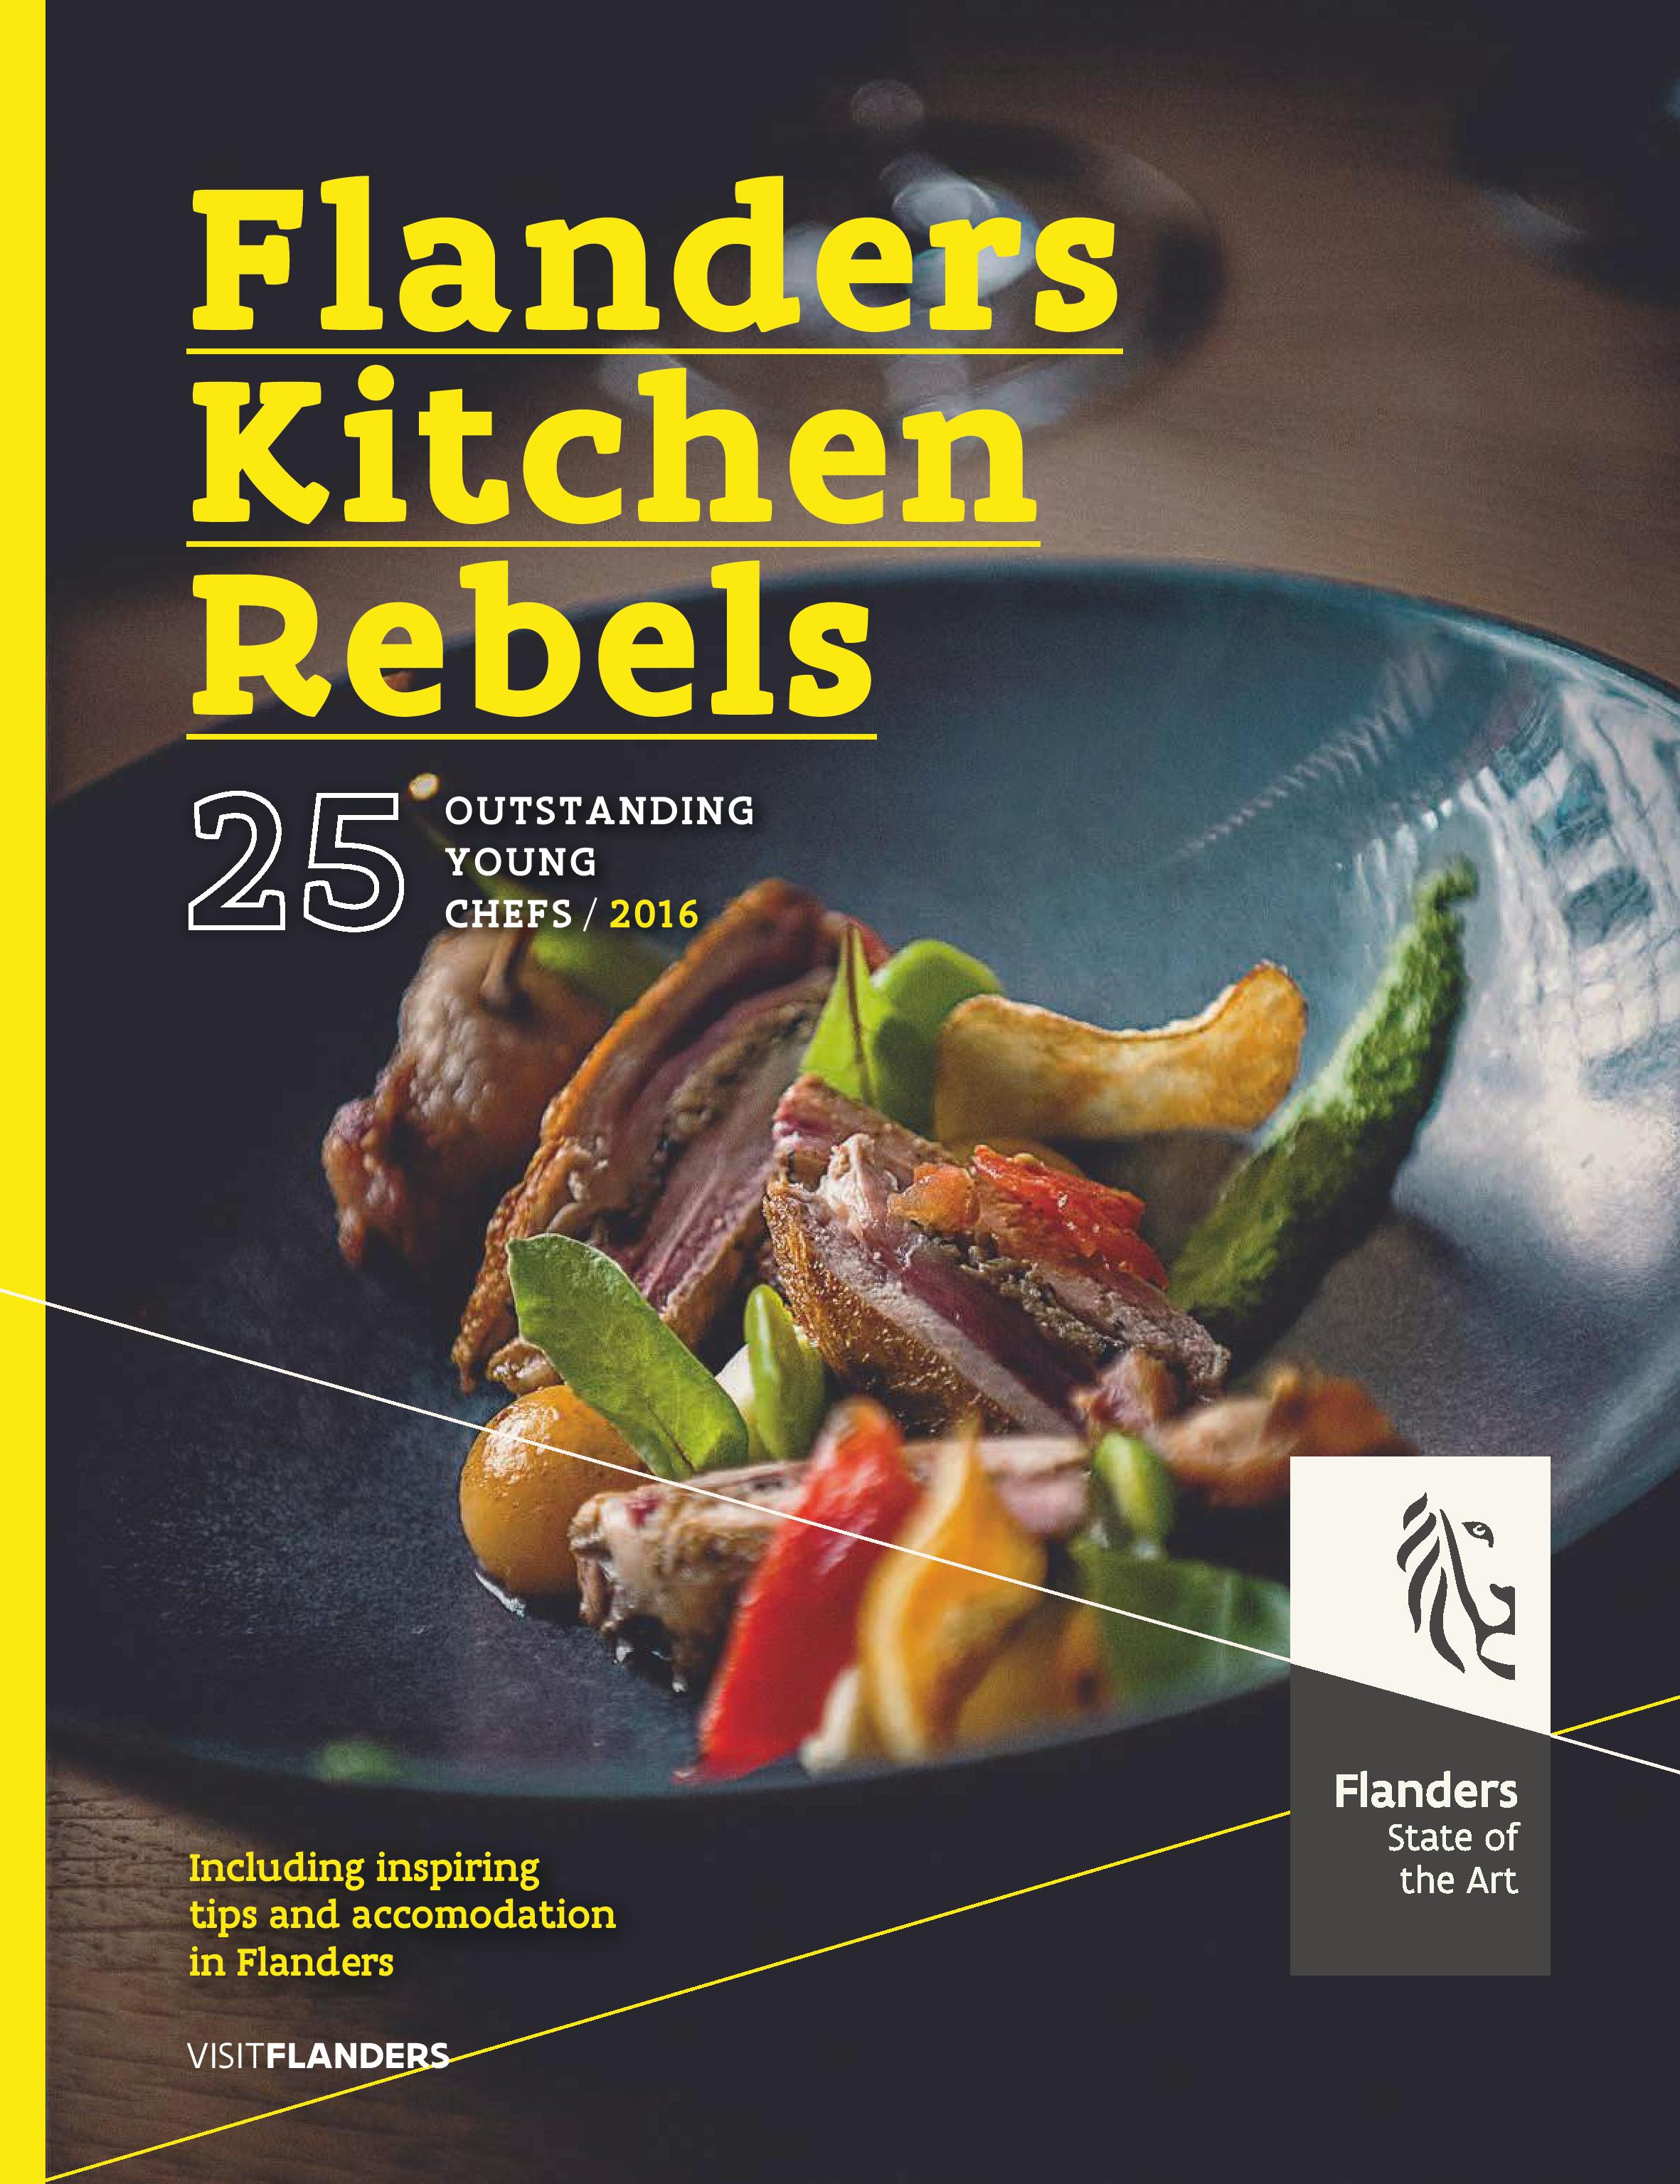 Flanders_Kitchen_Rebels_2015_EN_OutstandingYoungChefs_tcm13-66302-page-001.jpg